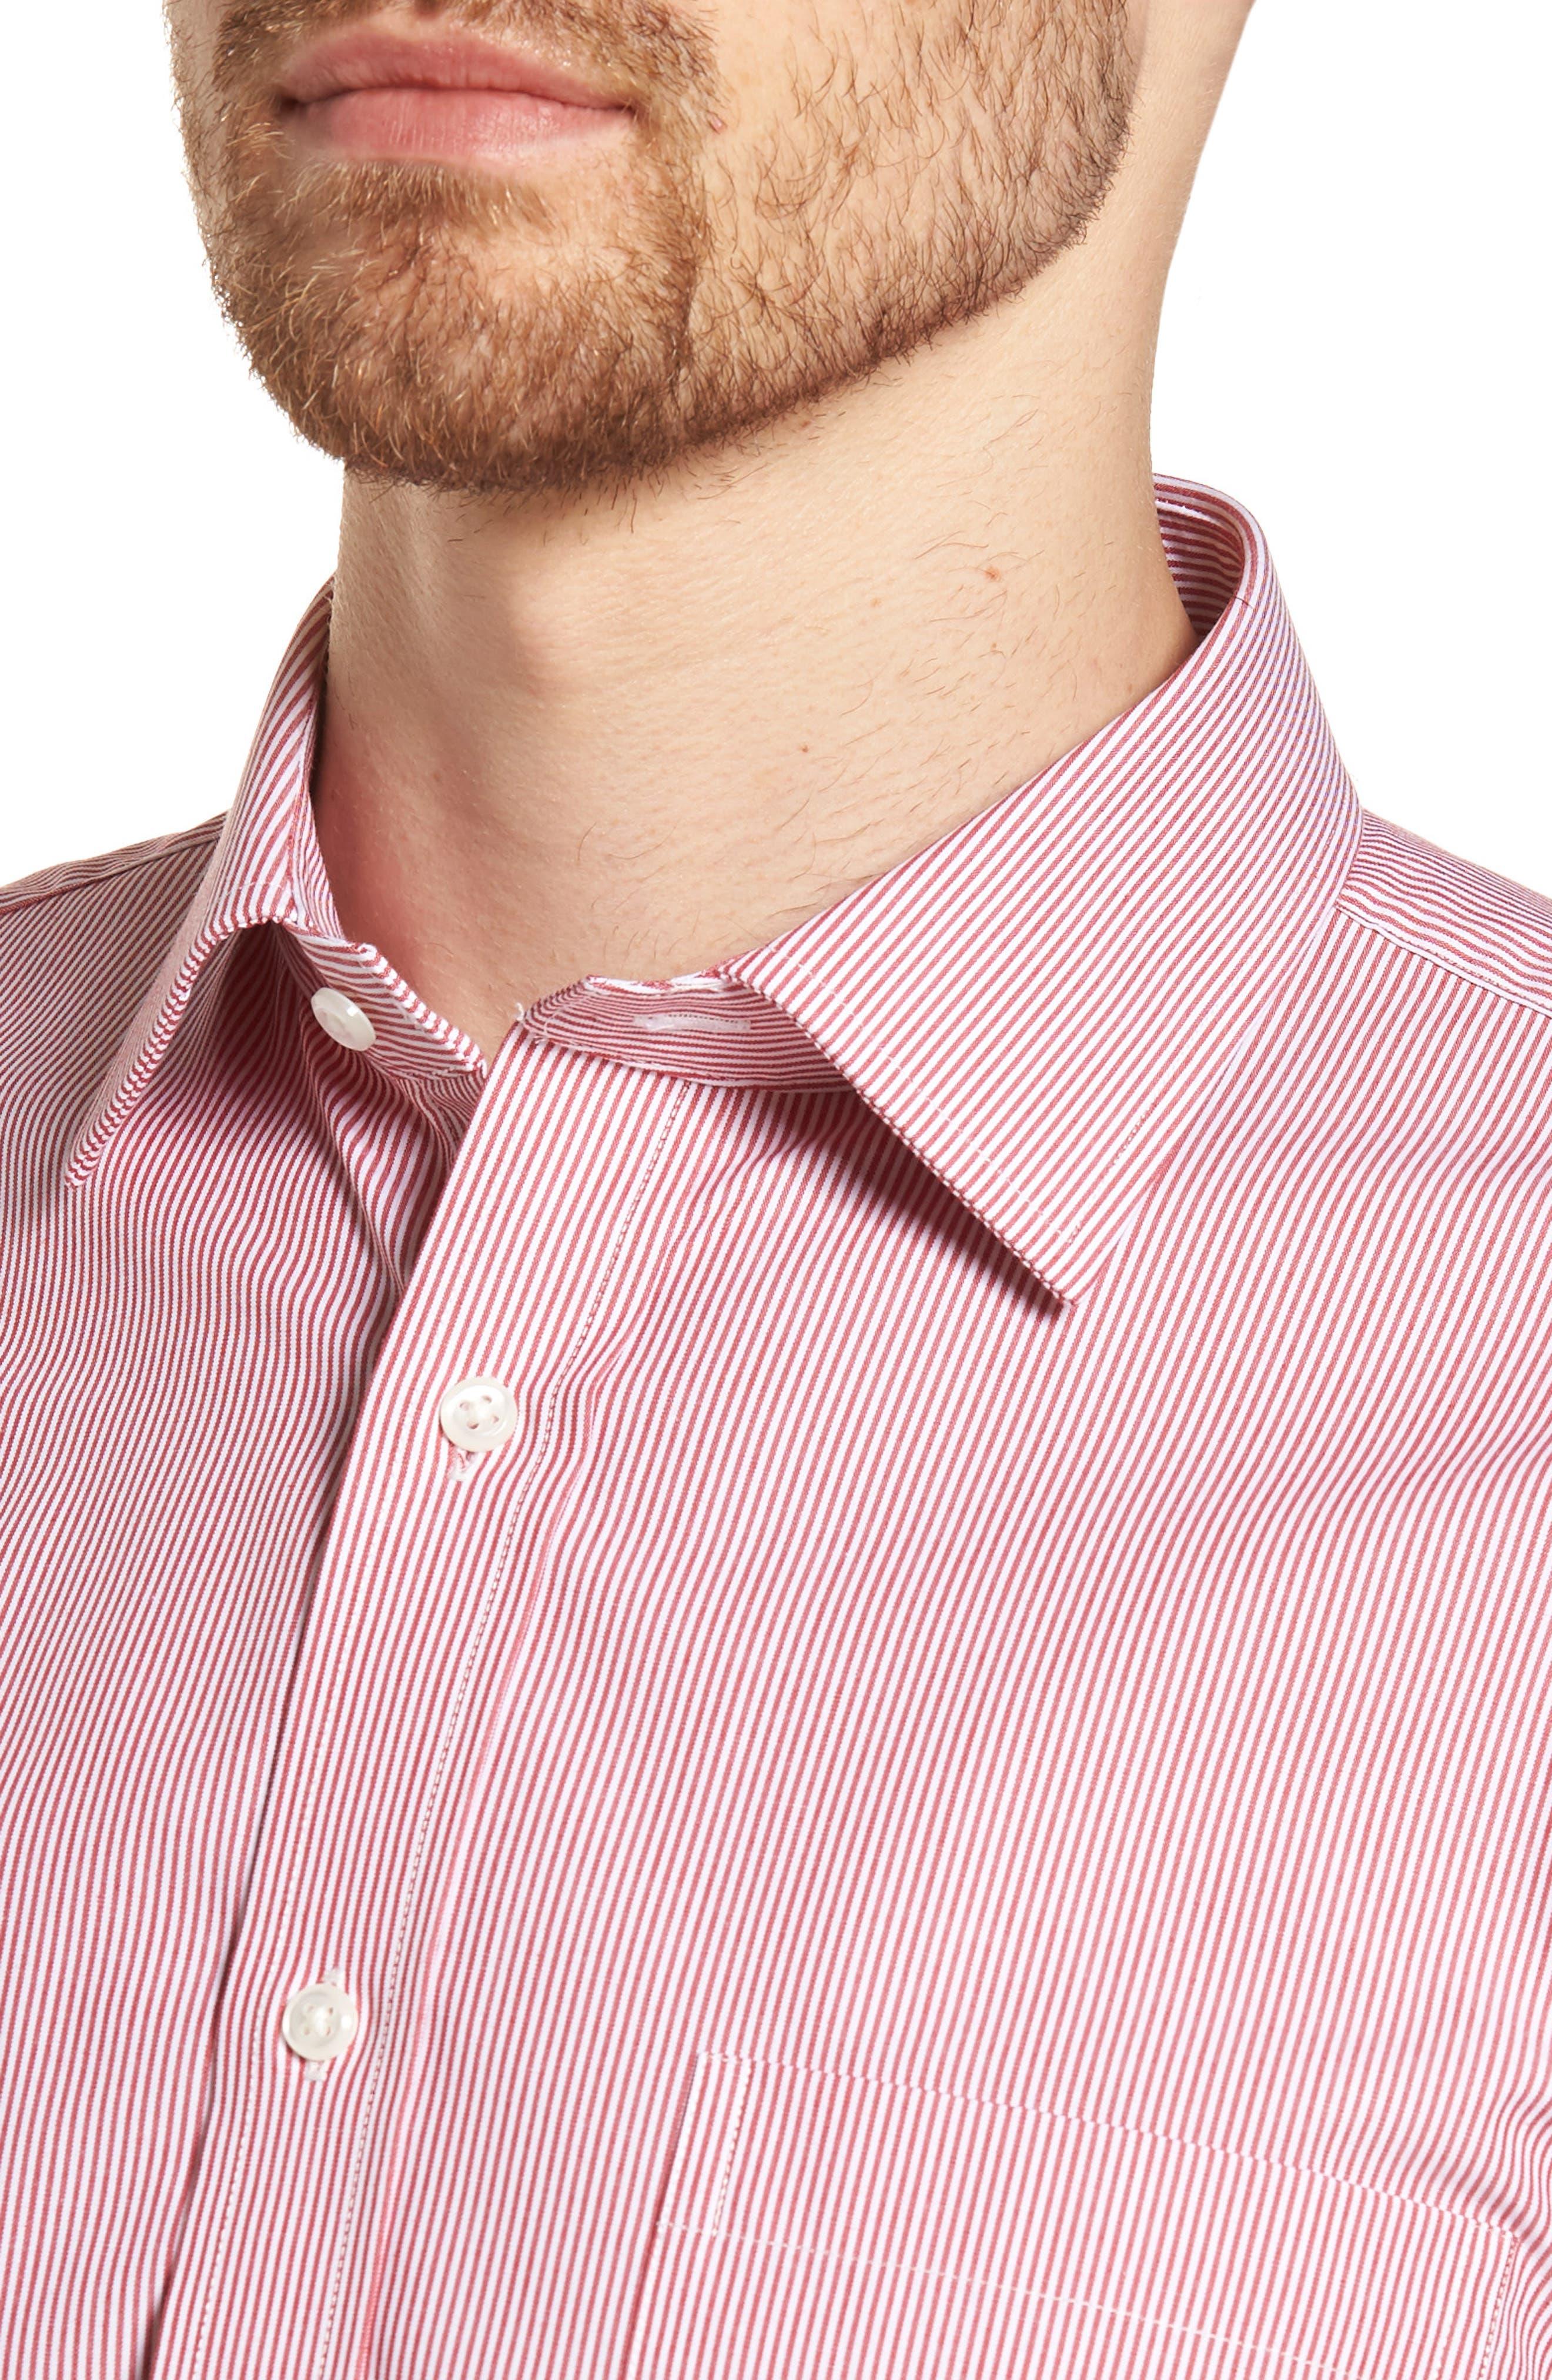 Trim Fit Non-Iron Stripe Dress Shirt,                             Alternate thumbnail 11, color,